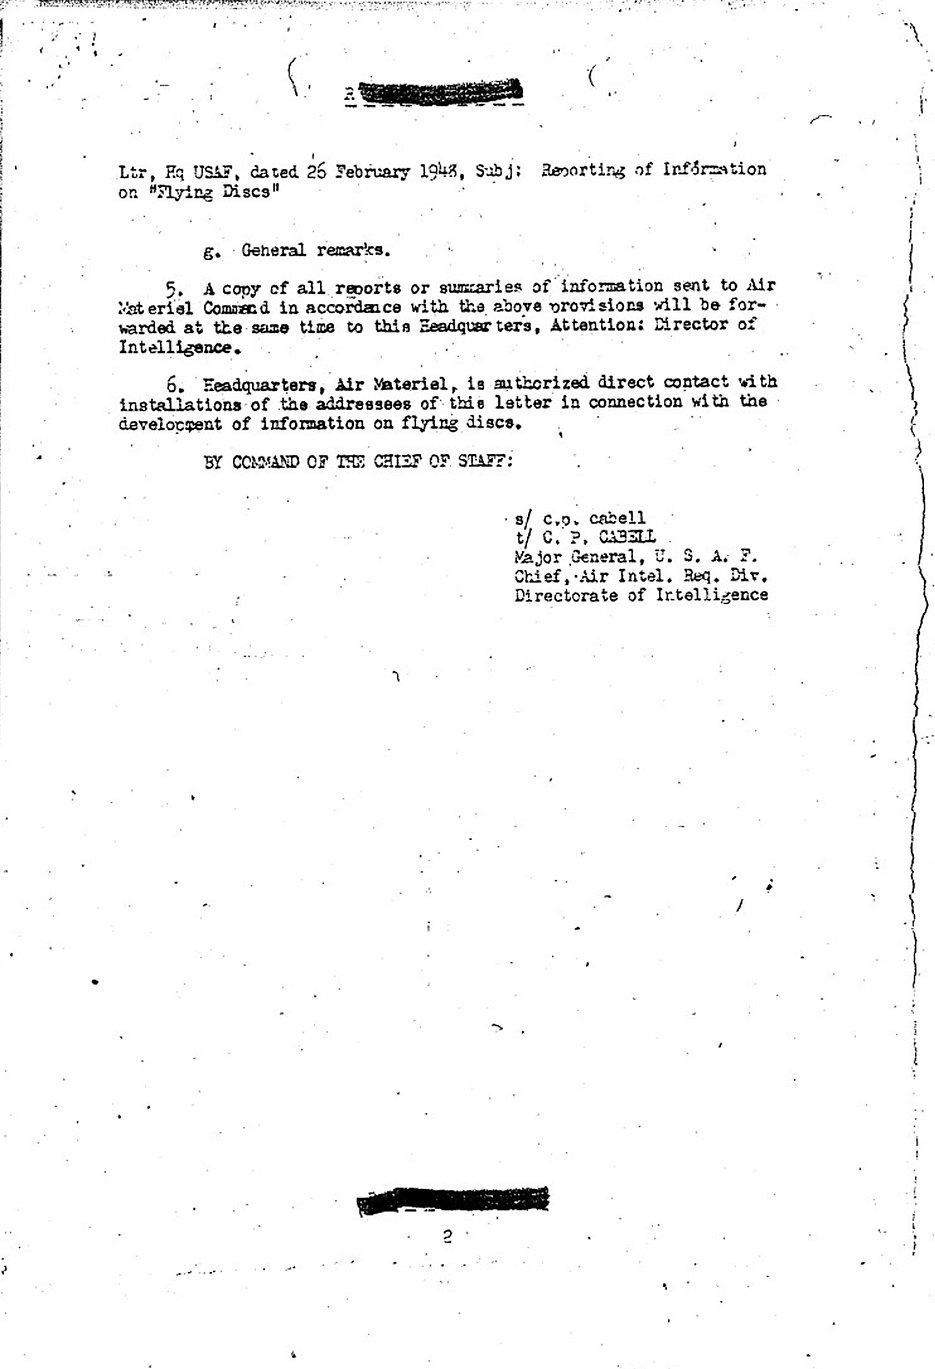 Feb_26_1948_02.jpg